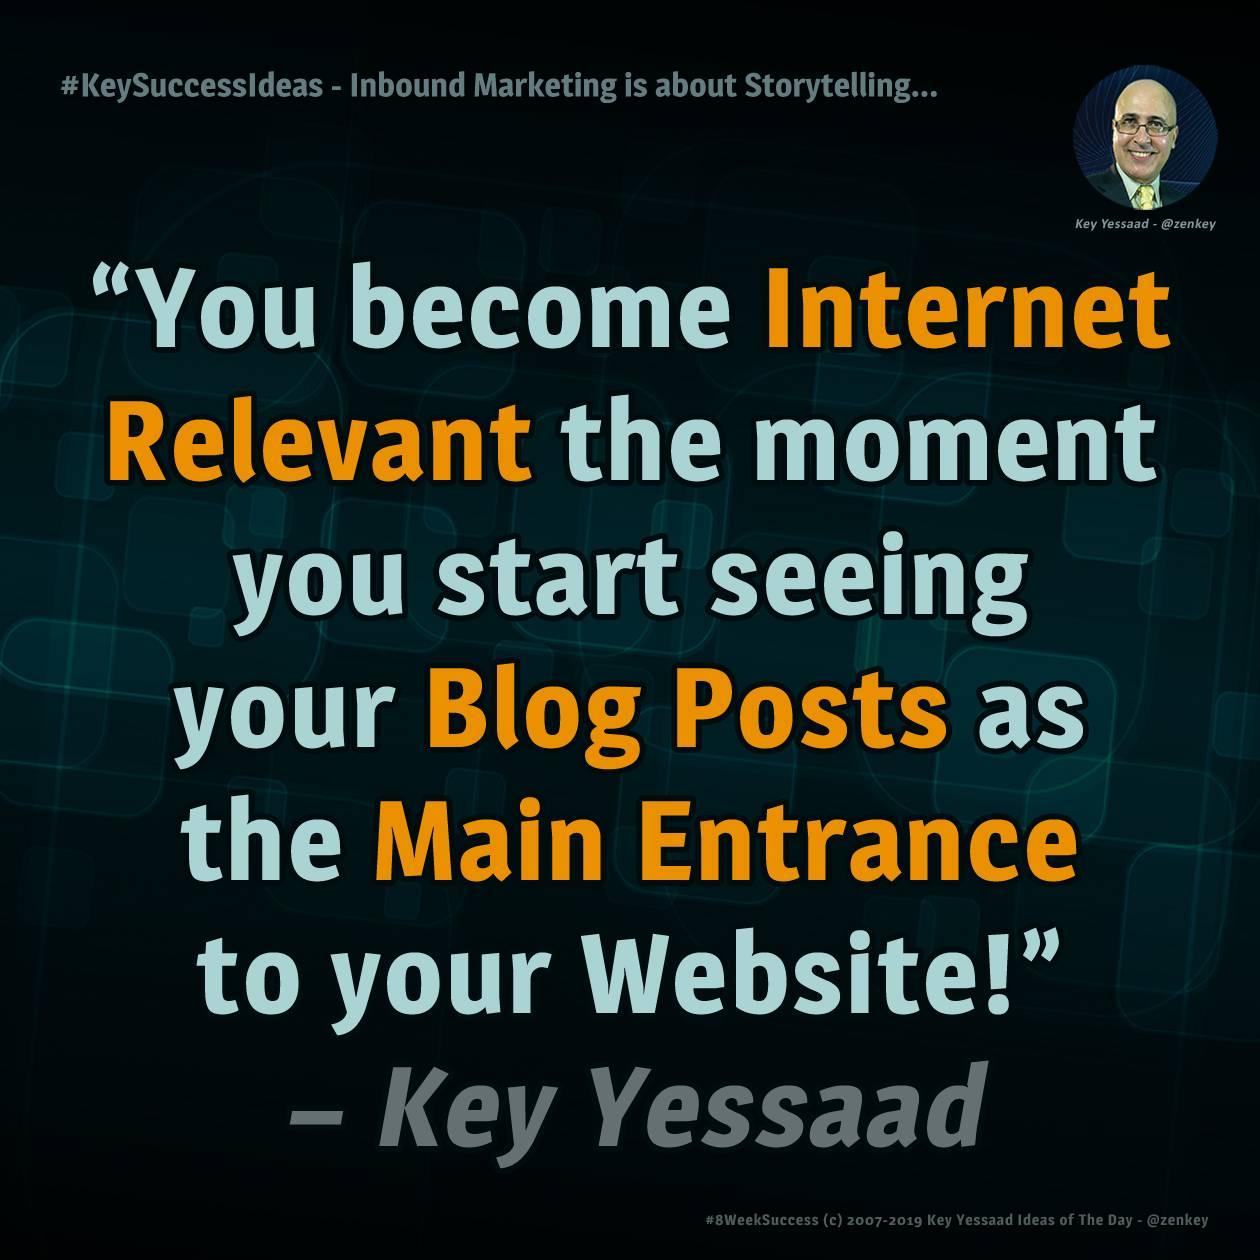 #KeySuccessIdeas - Inbound Marketing is about Storytelling...